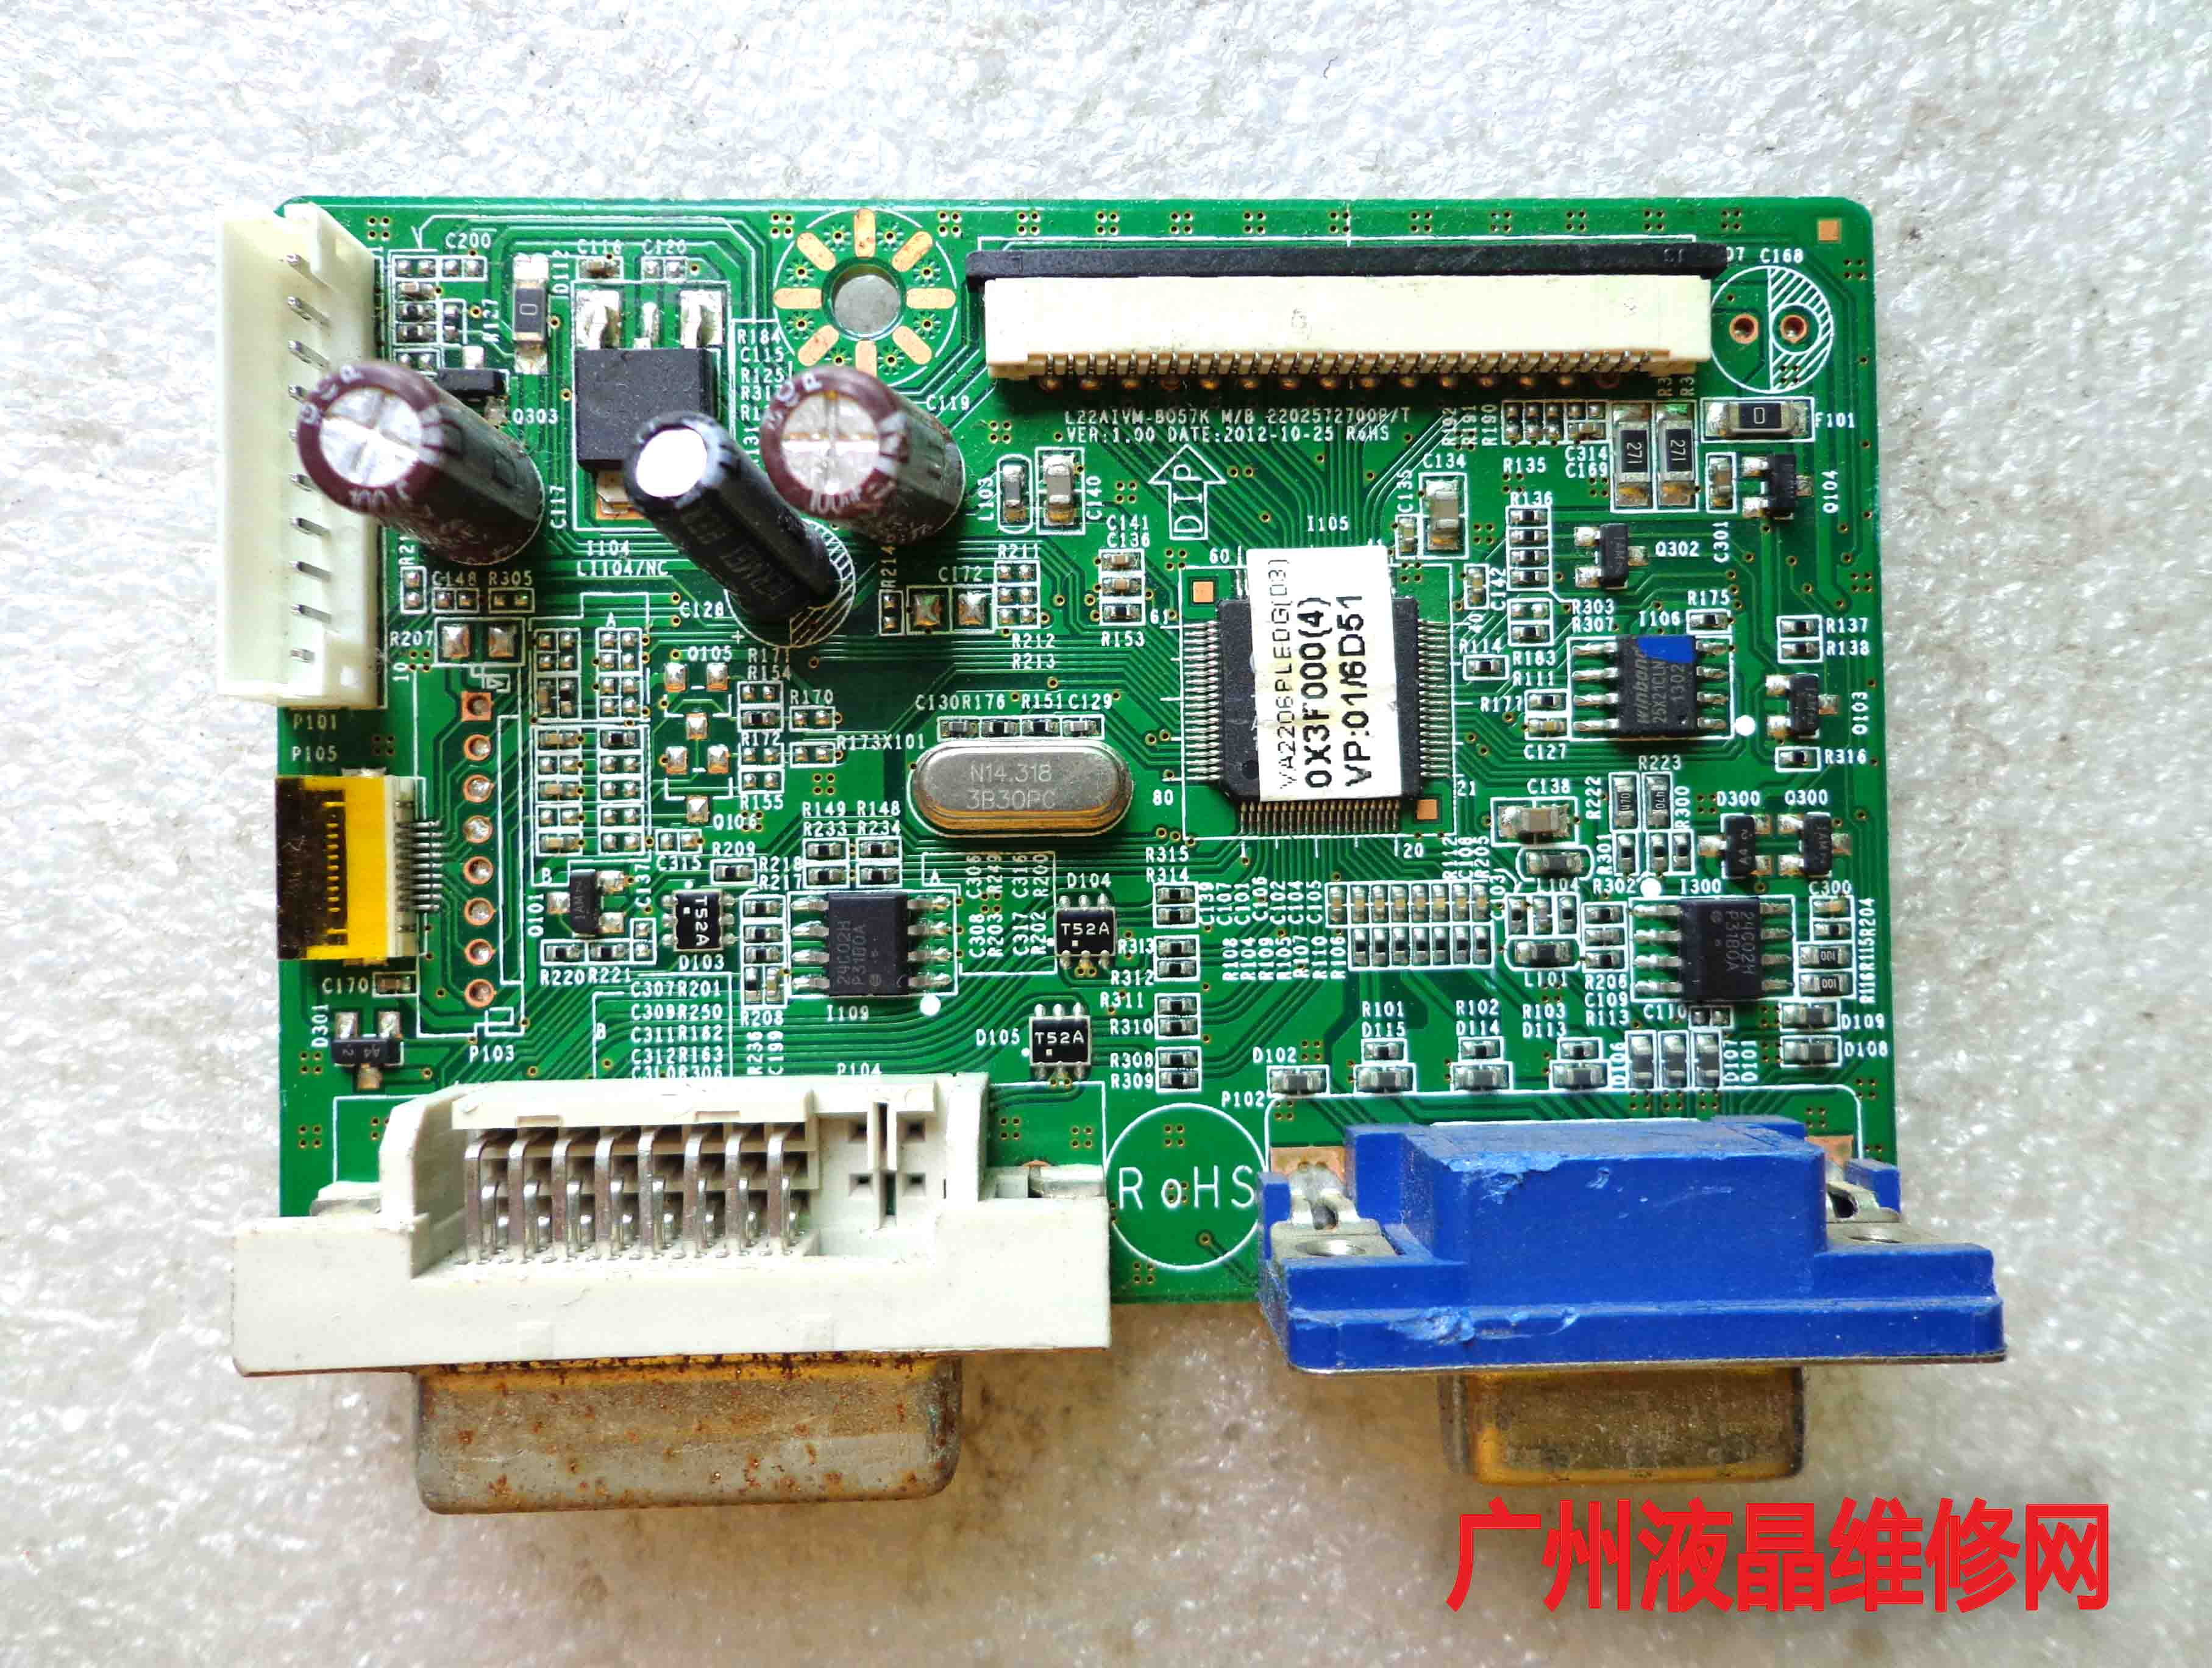 ViewSonic VA2206-LED Vs14476 L22AIVM-BO57K 2202572700 P/T Mainboard